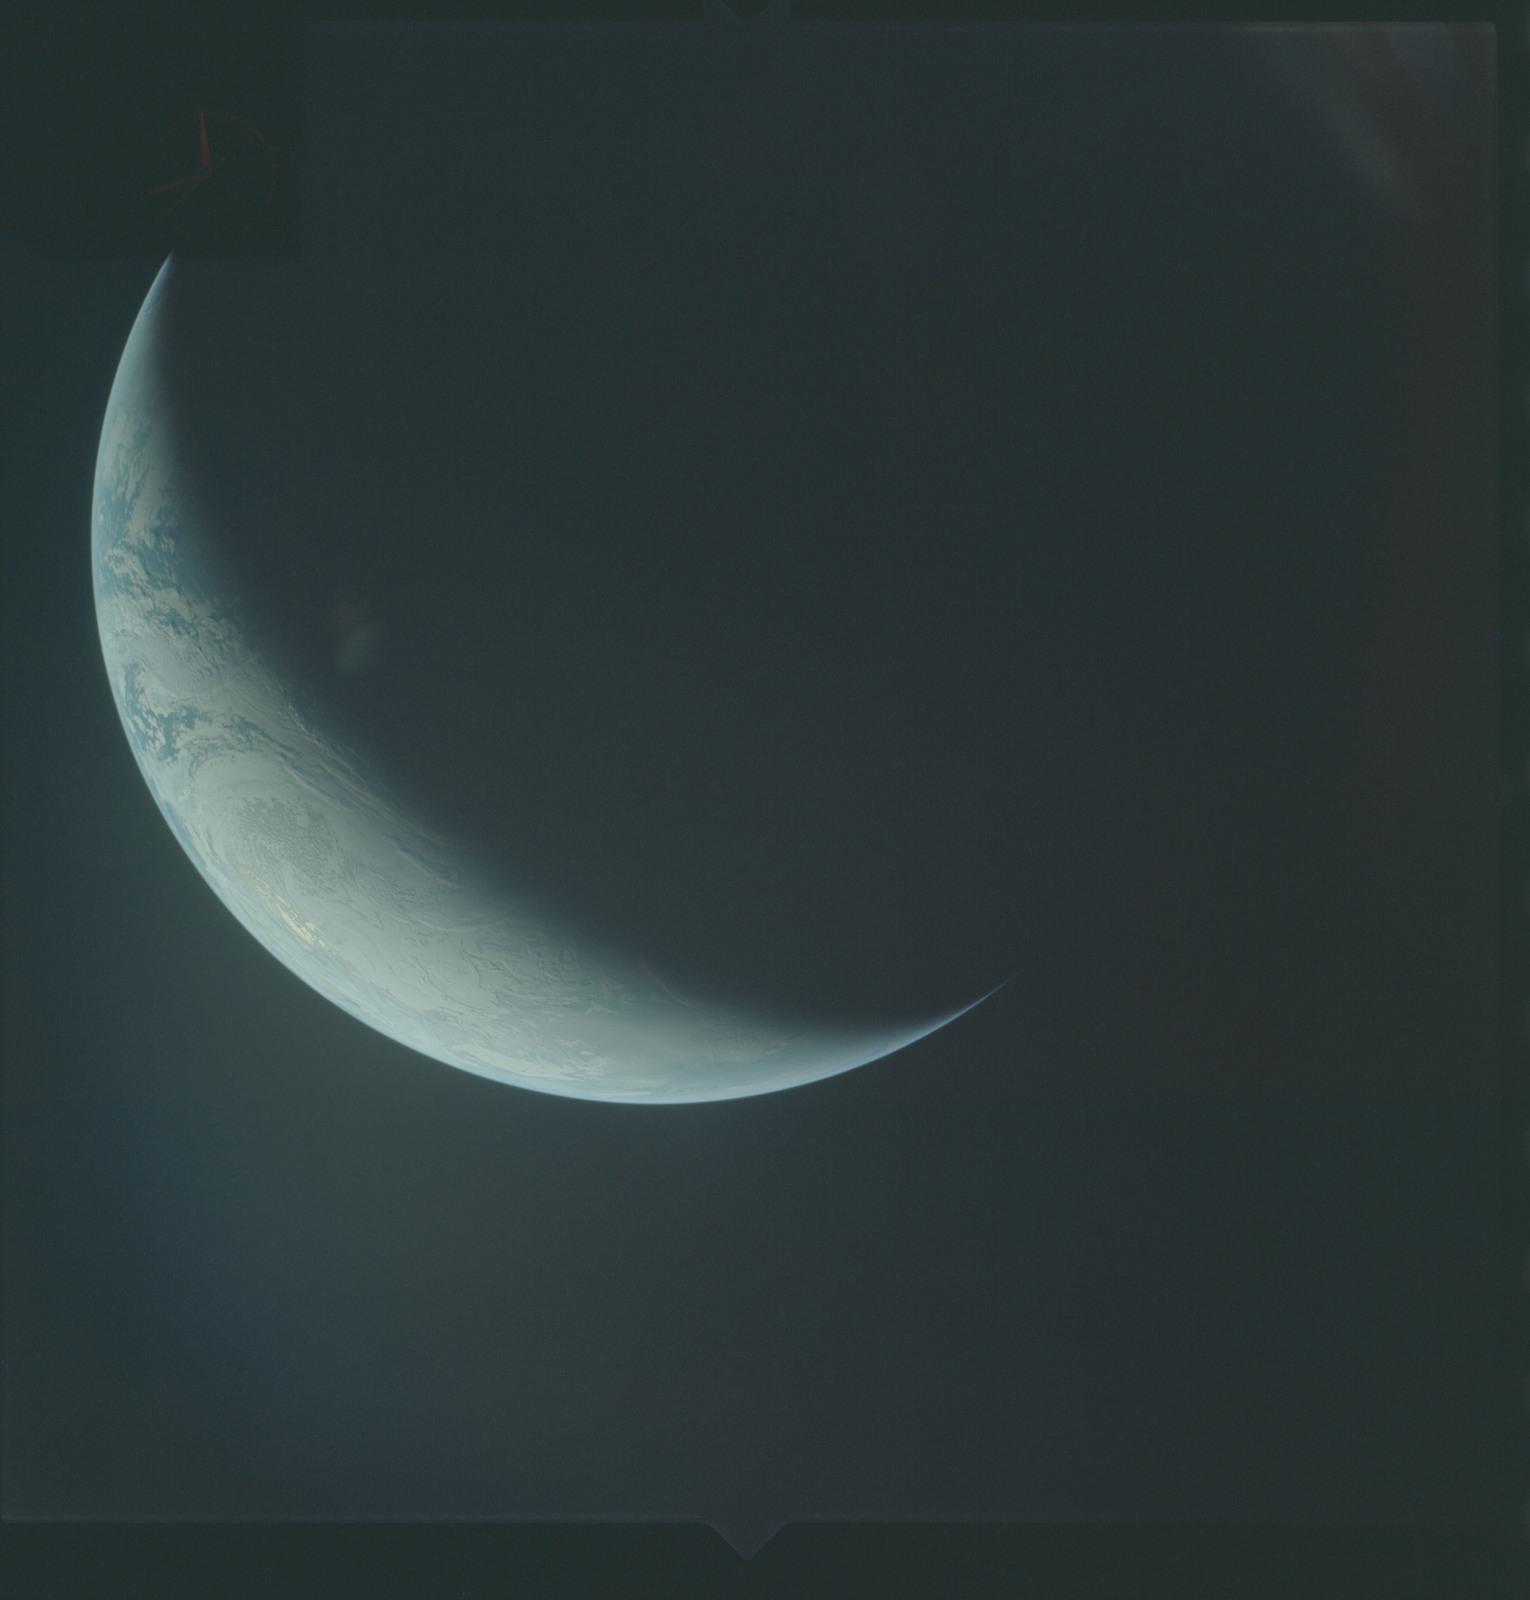 AS04-01-640 - Apollo 4 - Apollo 4 Mission - Atlantic Ocean,coastal Brazil,West Africa and Antarctica